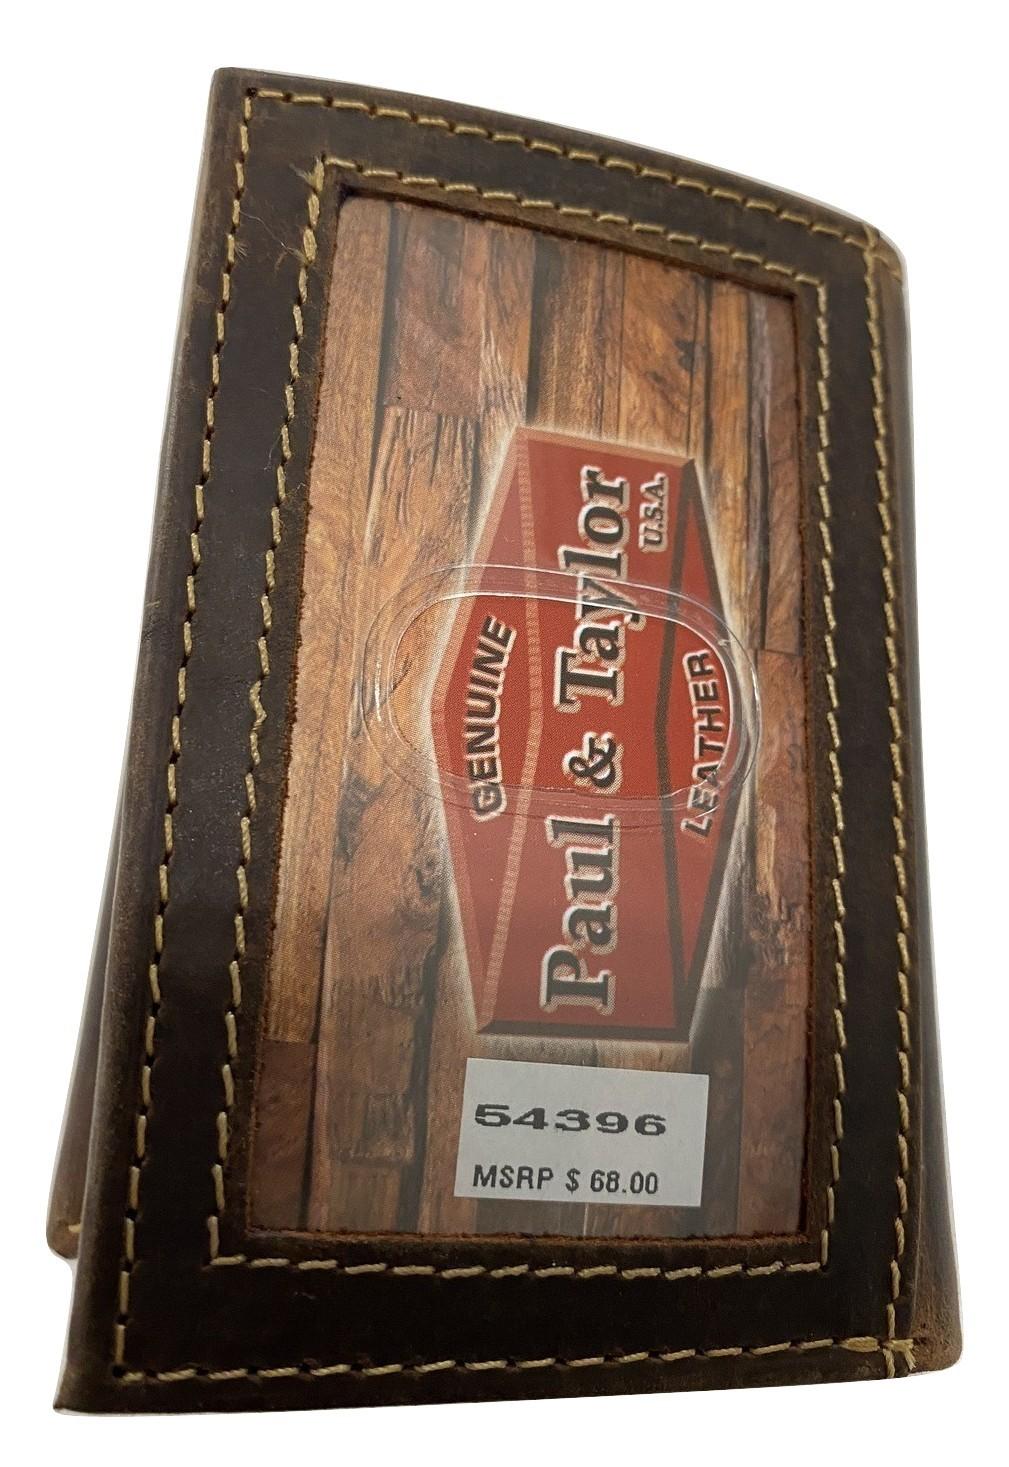 Paul & Taylor Hunter Buffalo Leather Trifold 54396 - $26.95